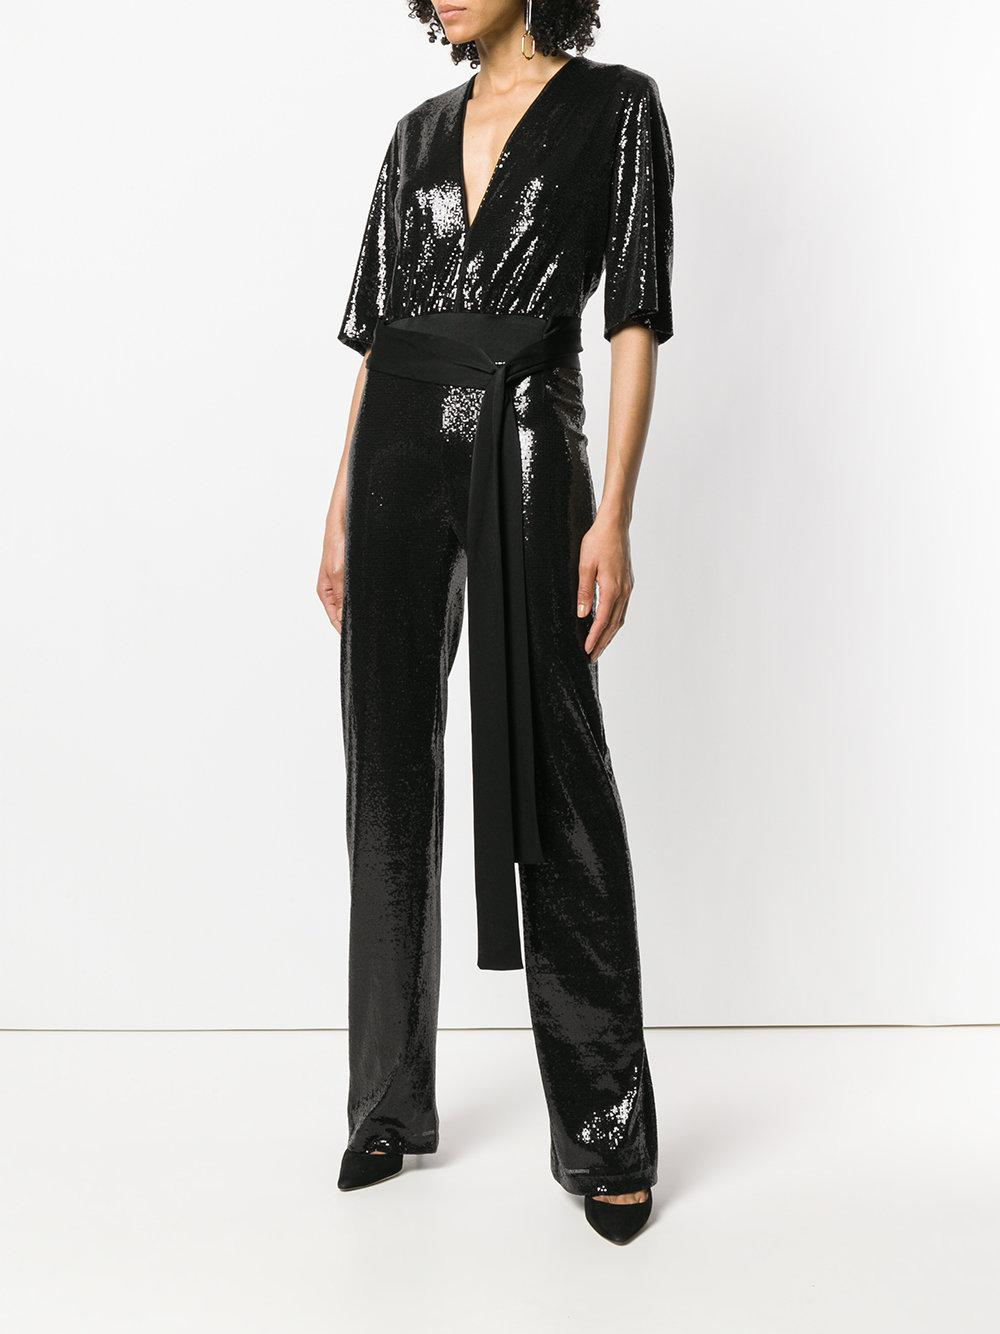 0161b71599a Galvan - Black Galaxy Sequin Jumpsuit - Lyst. View fullscreen